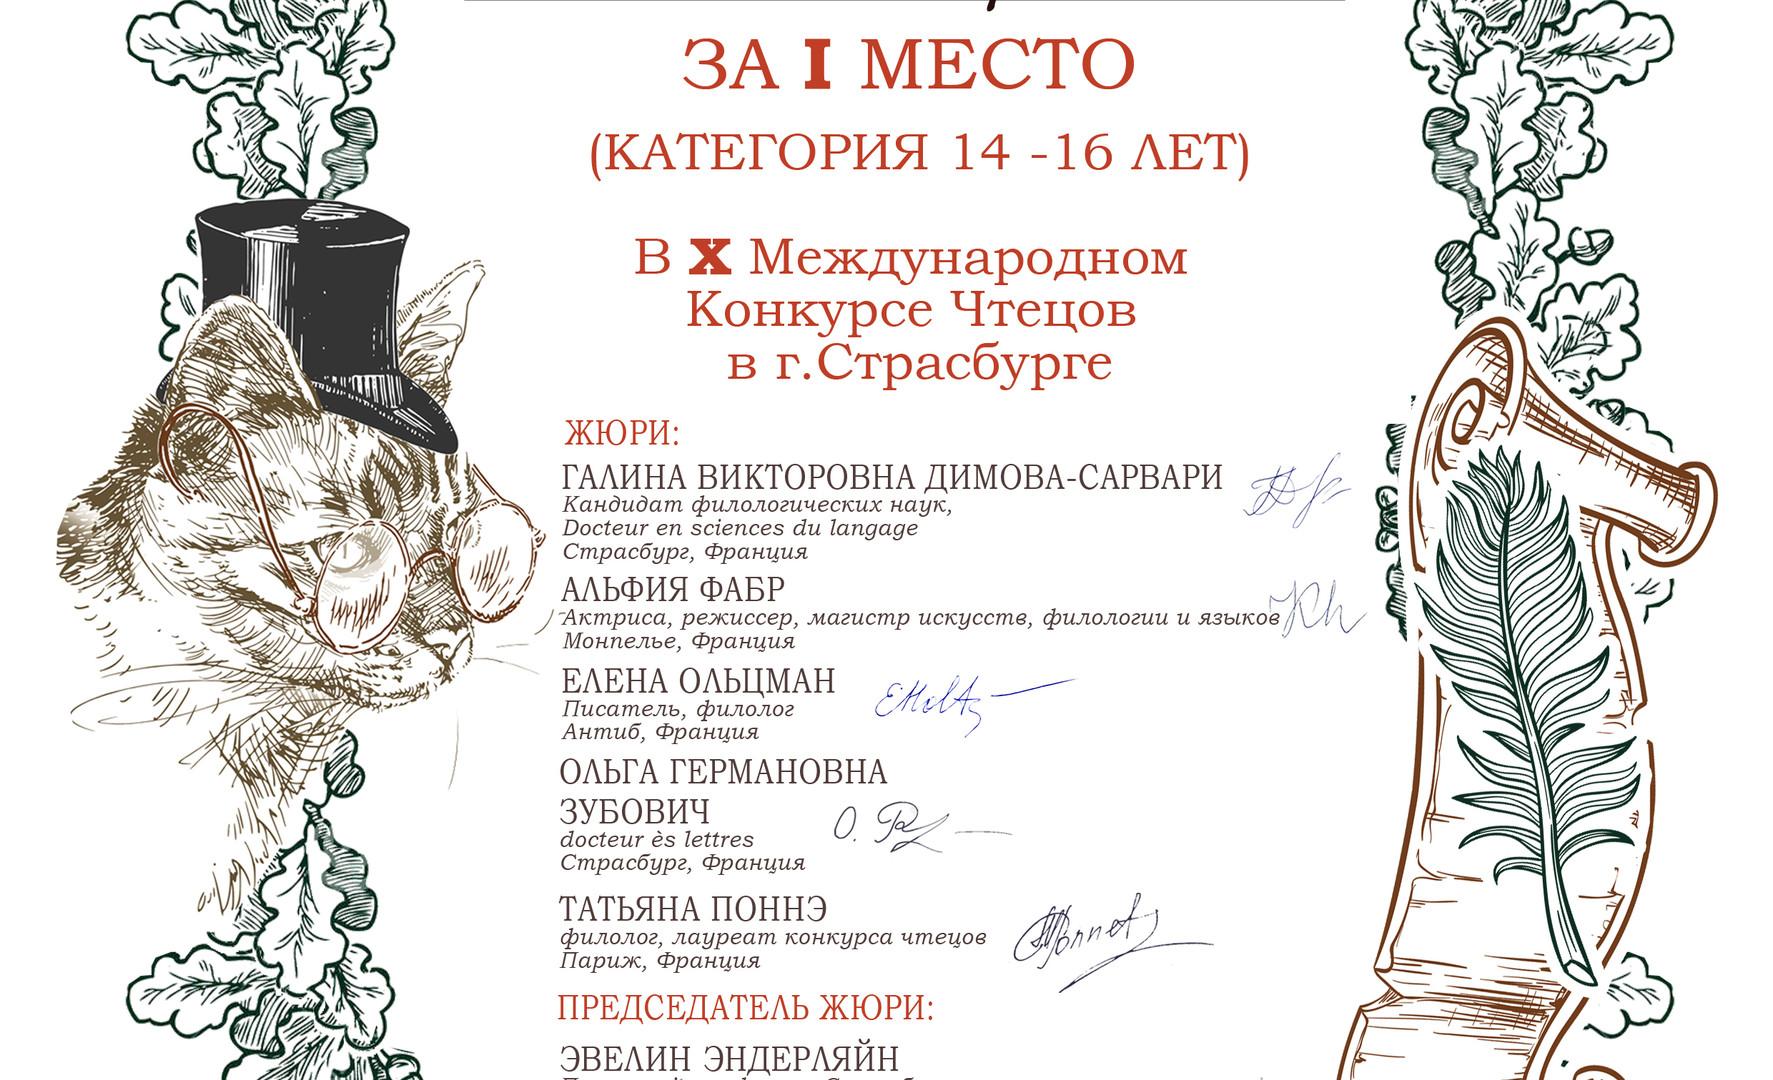 Diplom_KCH_X_1_place_14-16.jpg